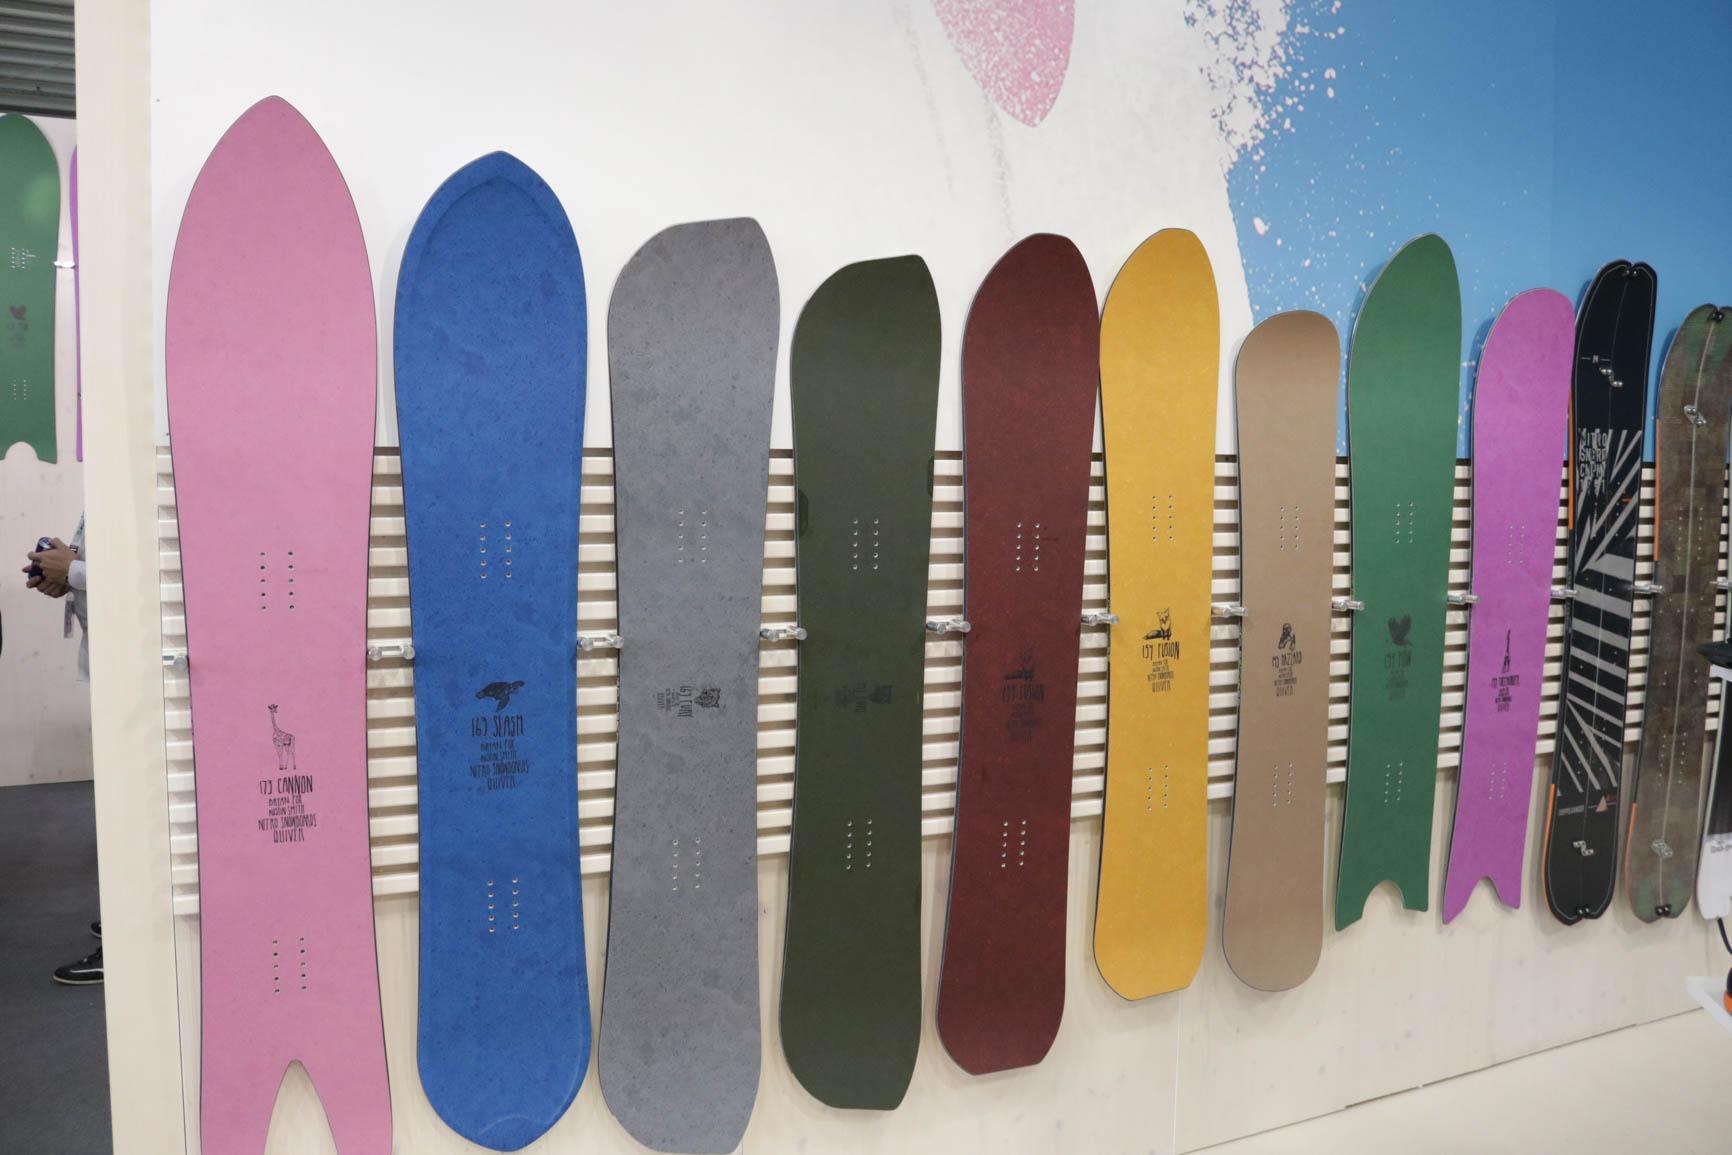 Nitro Snowboards Quiver 18/19